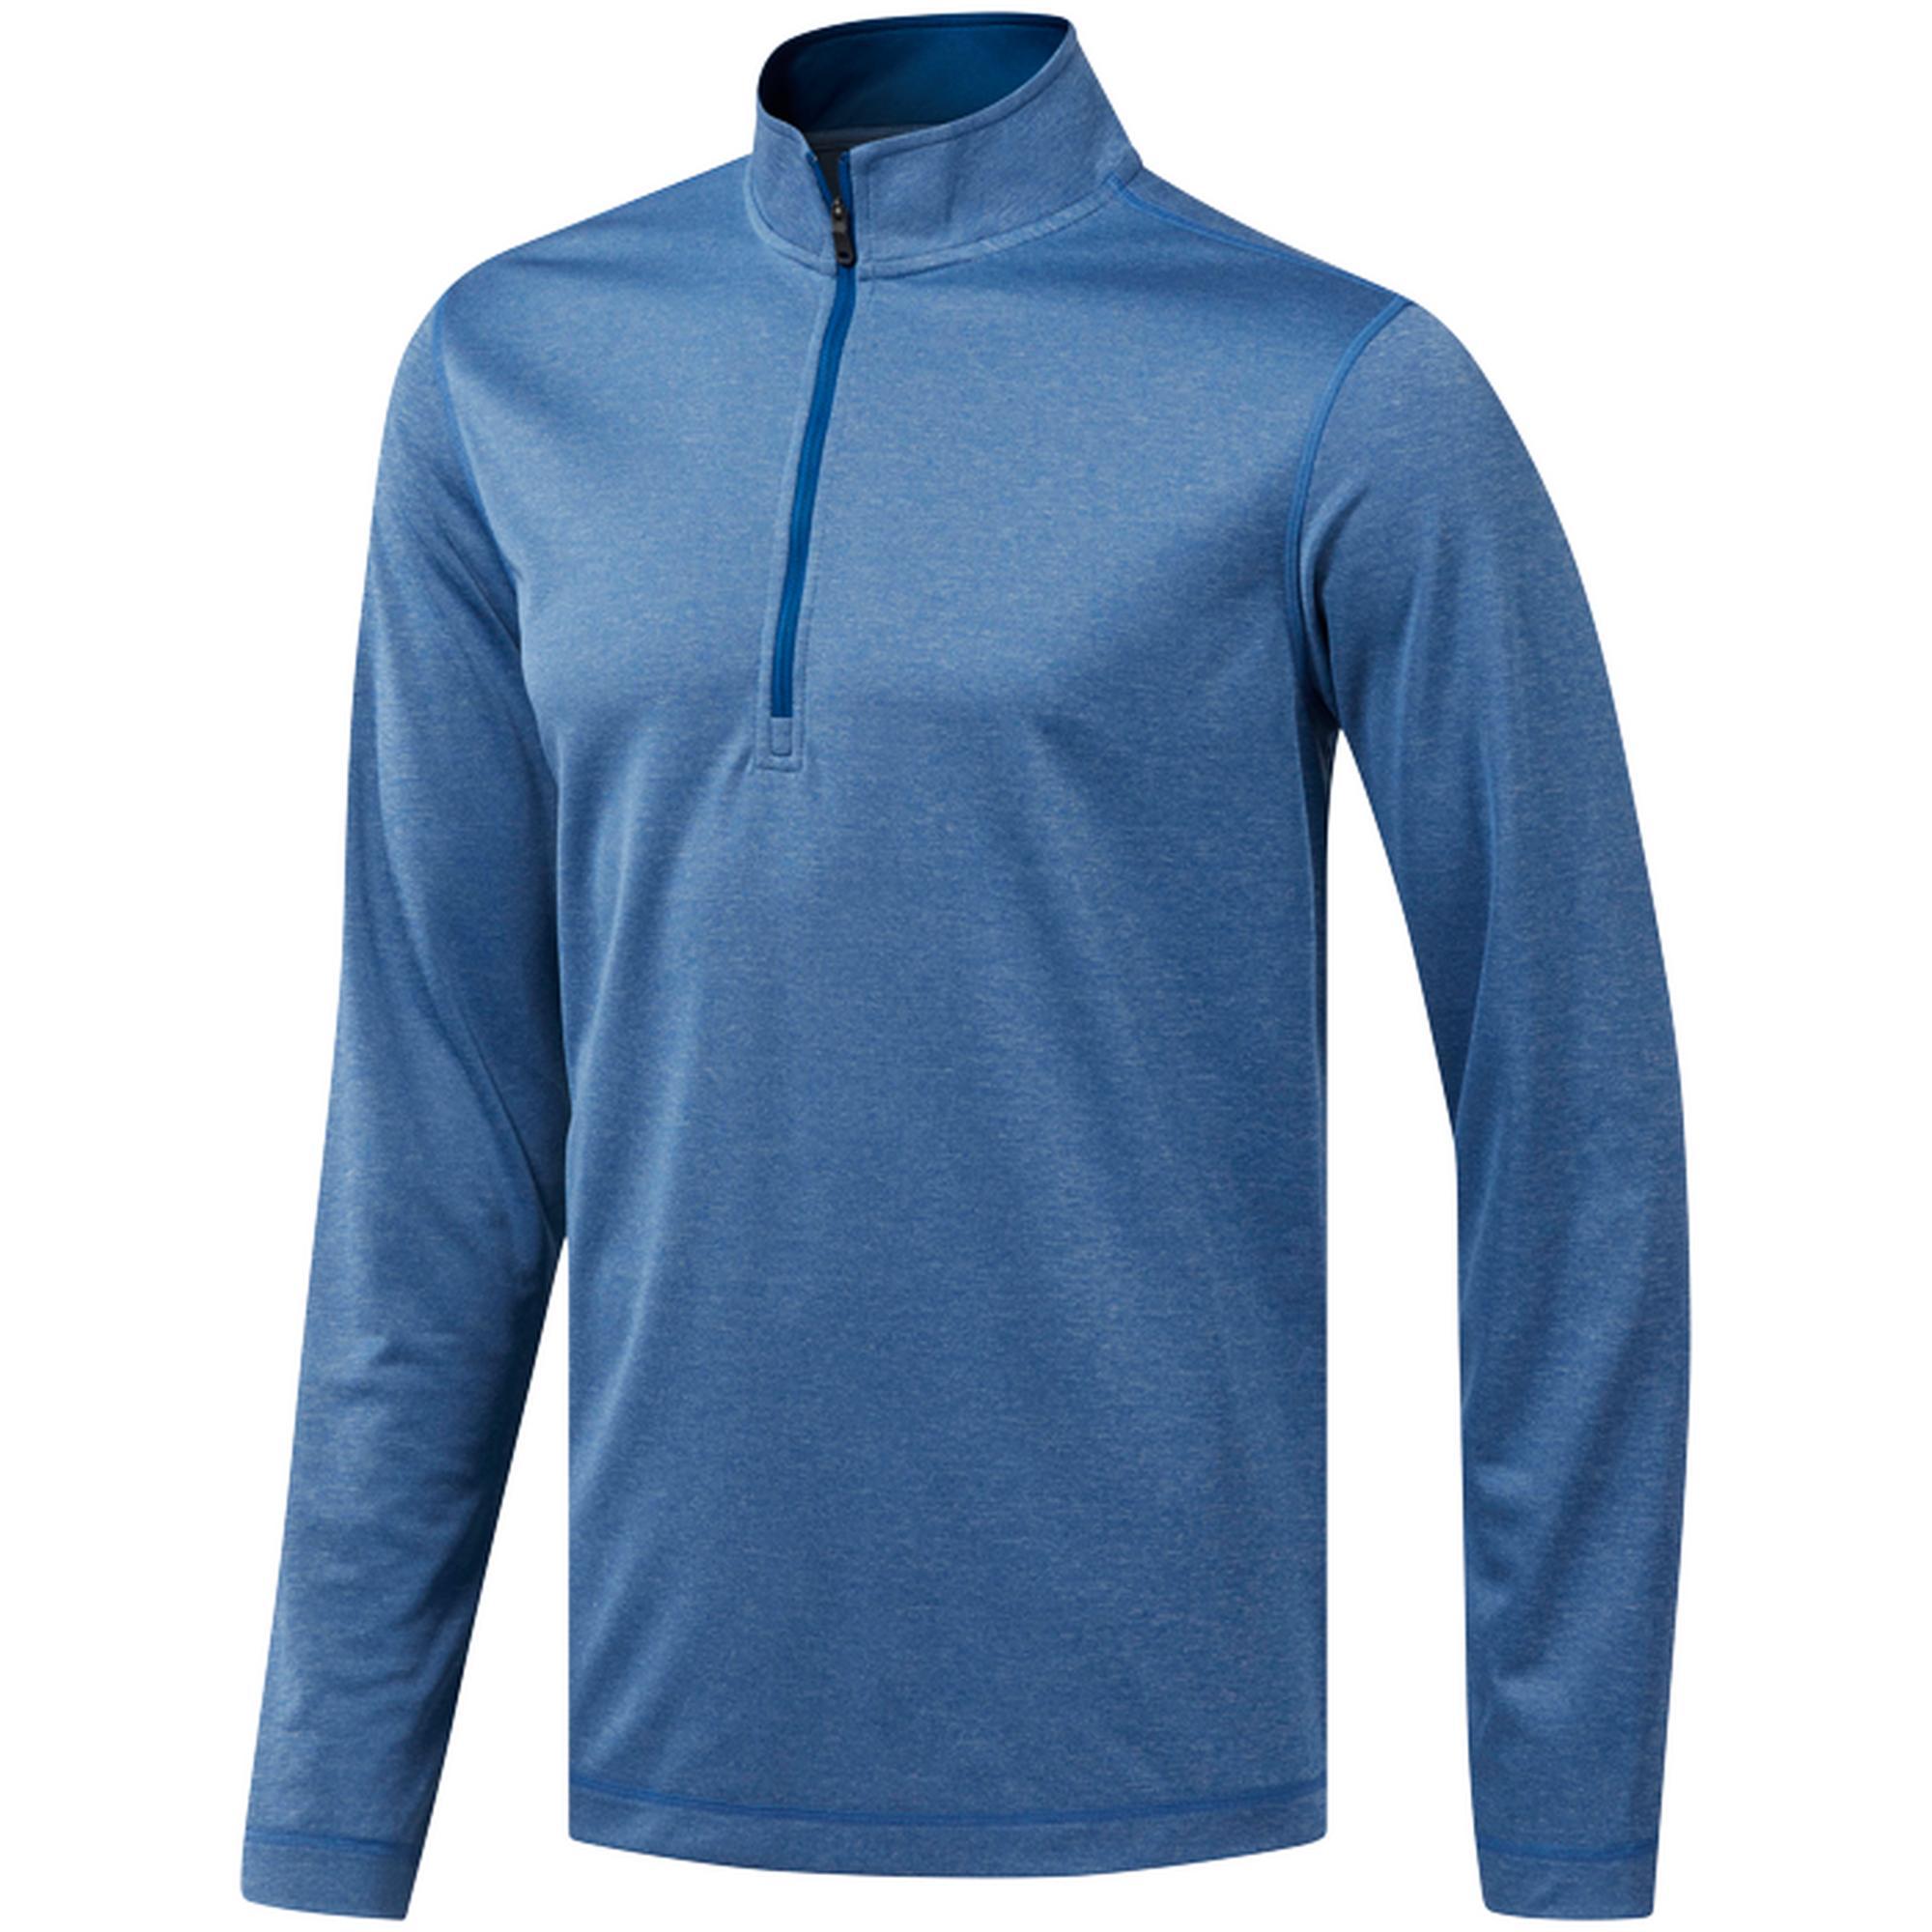 Men's UV Protection 1/4 Zip Pullover